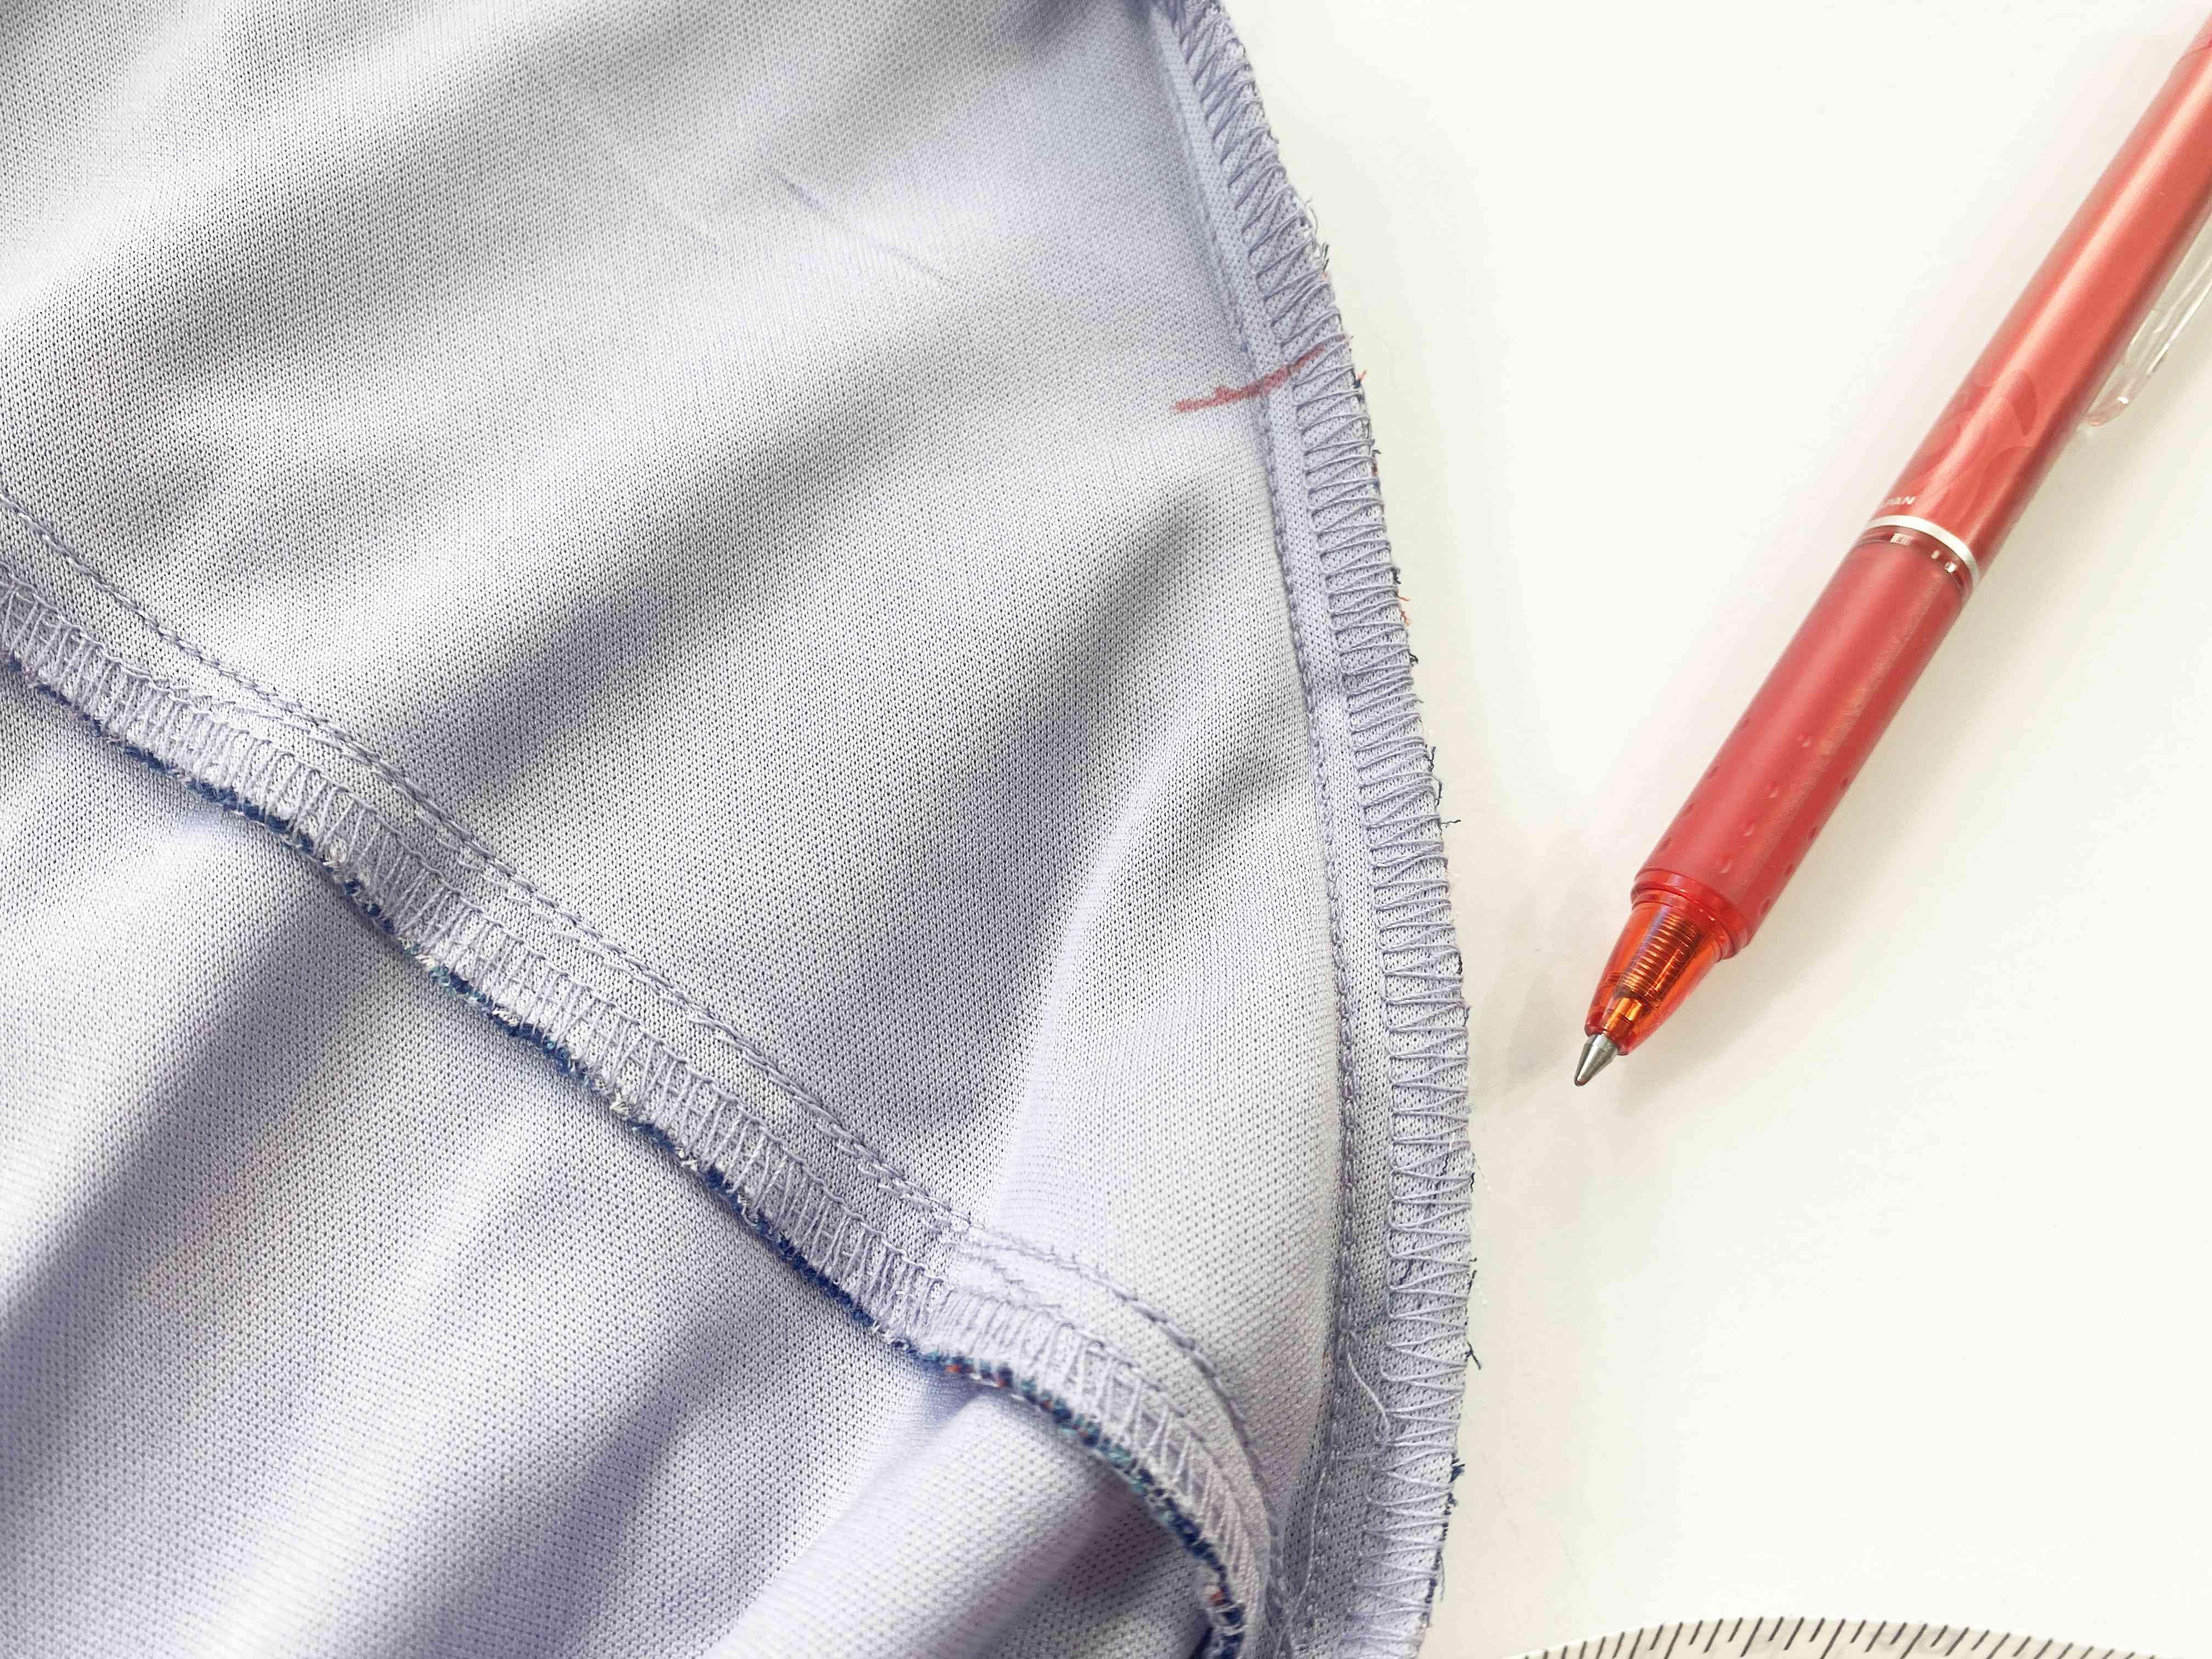 A dress and marking pen